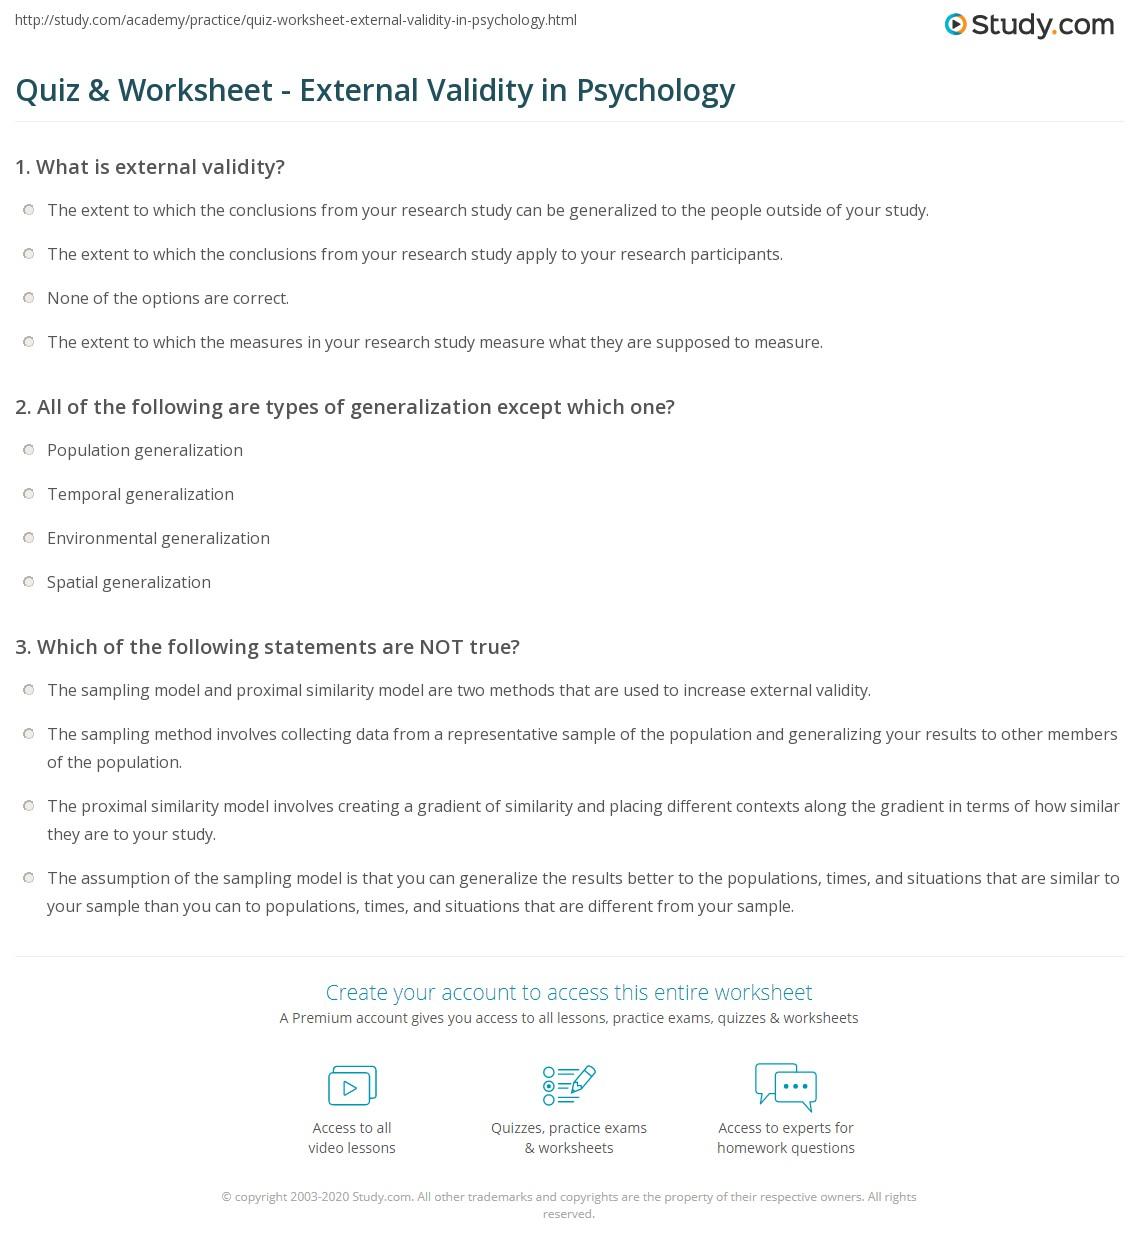 External Environment Worksheet : Quiz worksheet external validity in psychology study